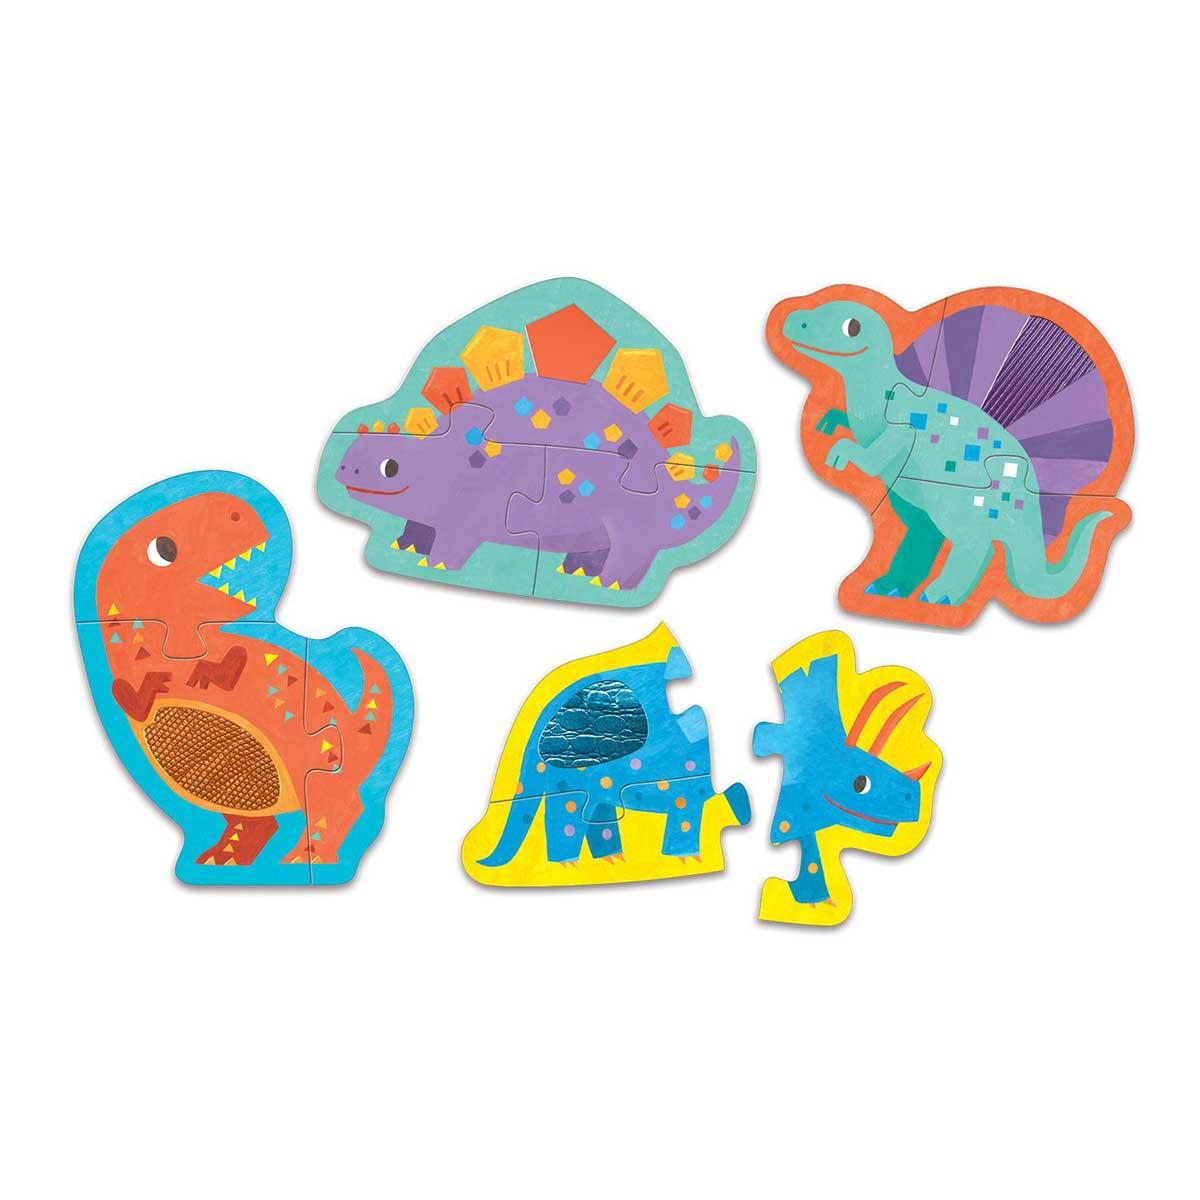 Mighty Dinosaurs Dinosaurs Jigsaw Puzzle